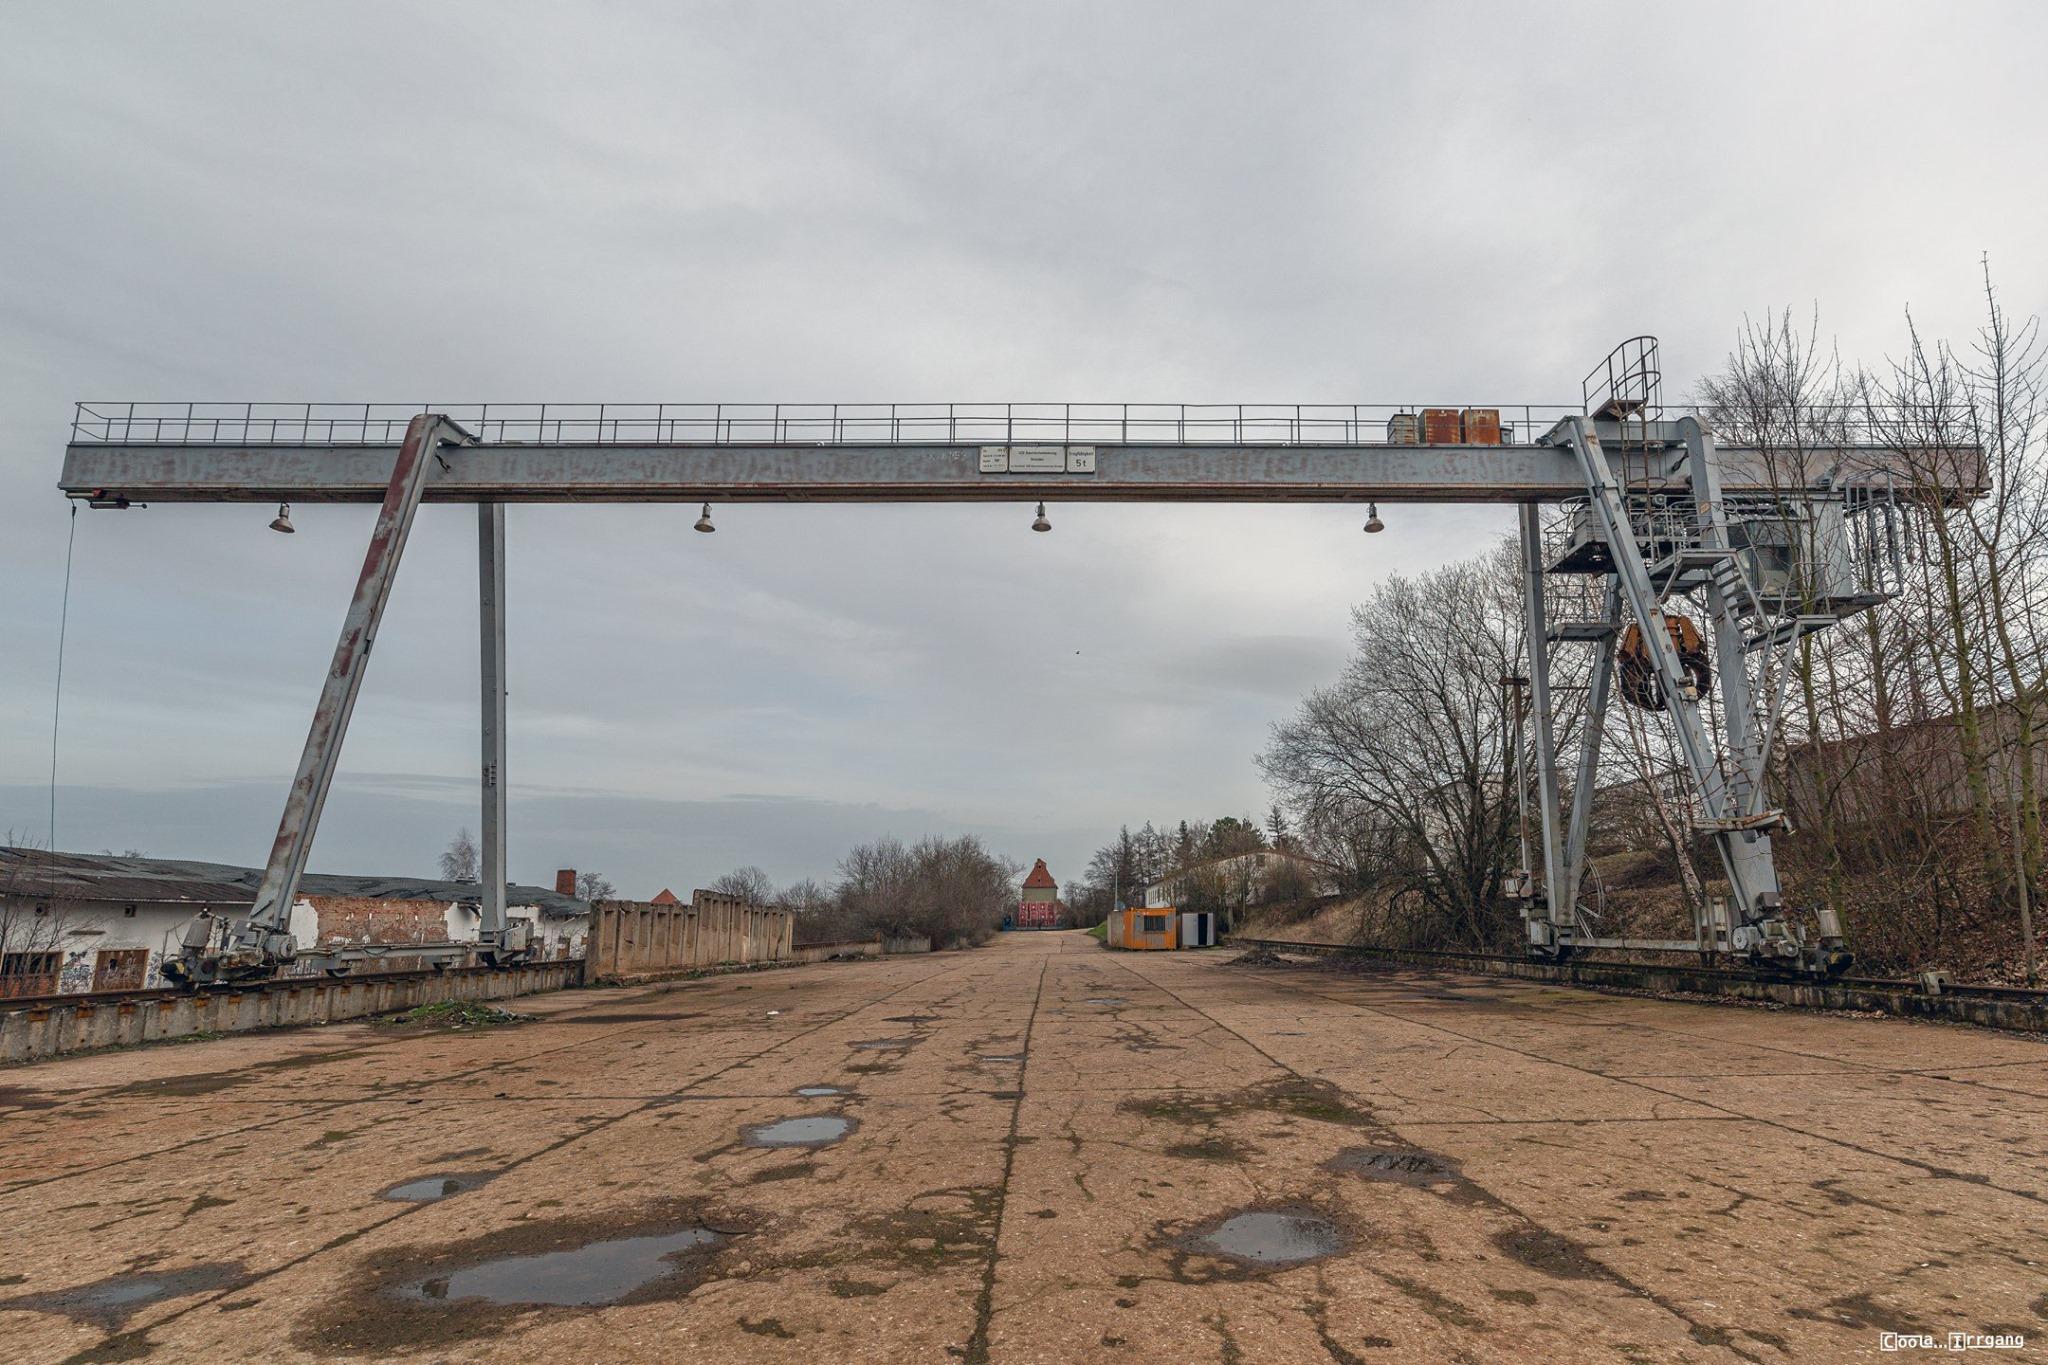 Güterabfertigung-Bad-langensalza7